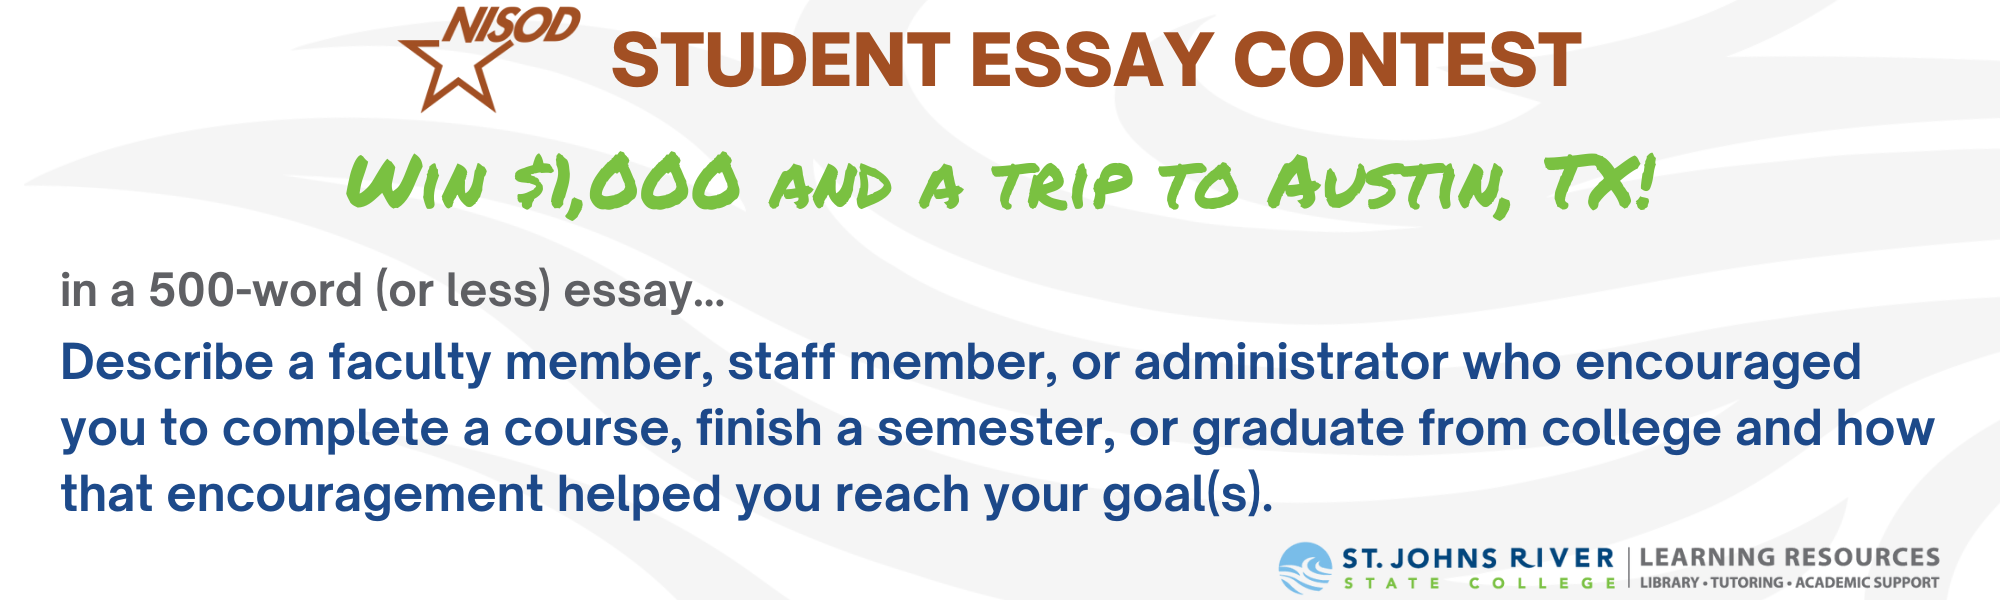 NISOD Student Essay Contest